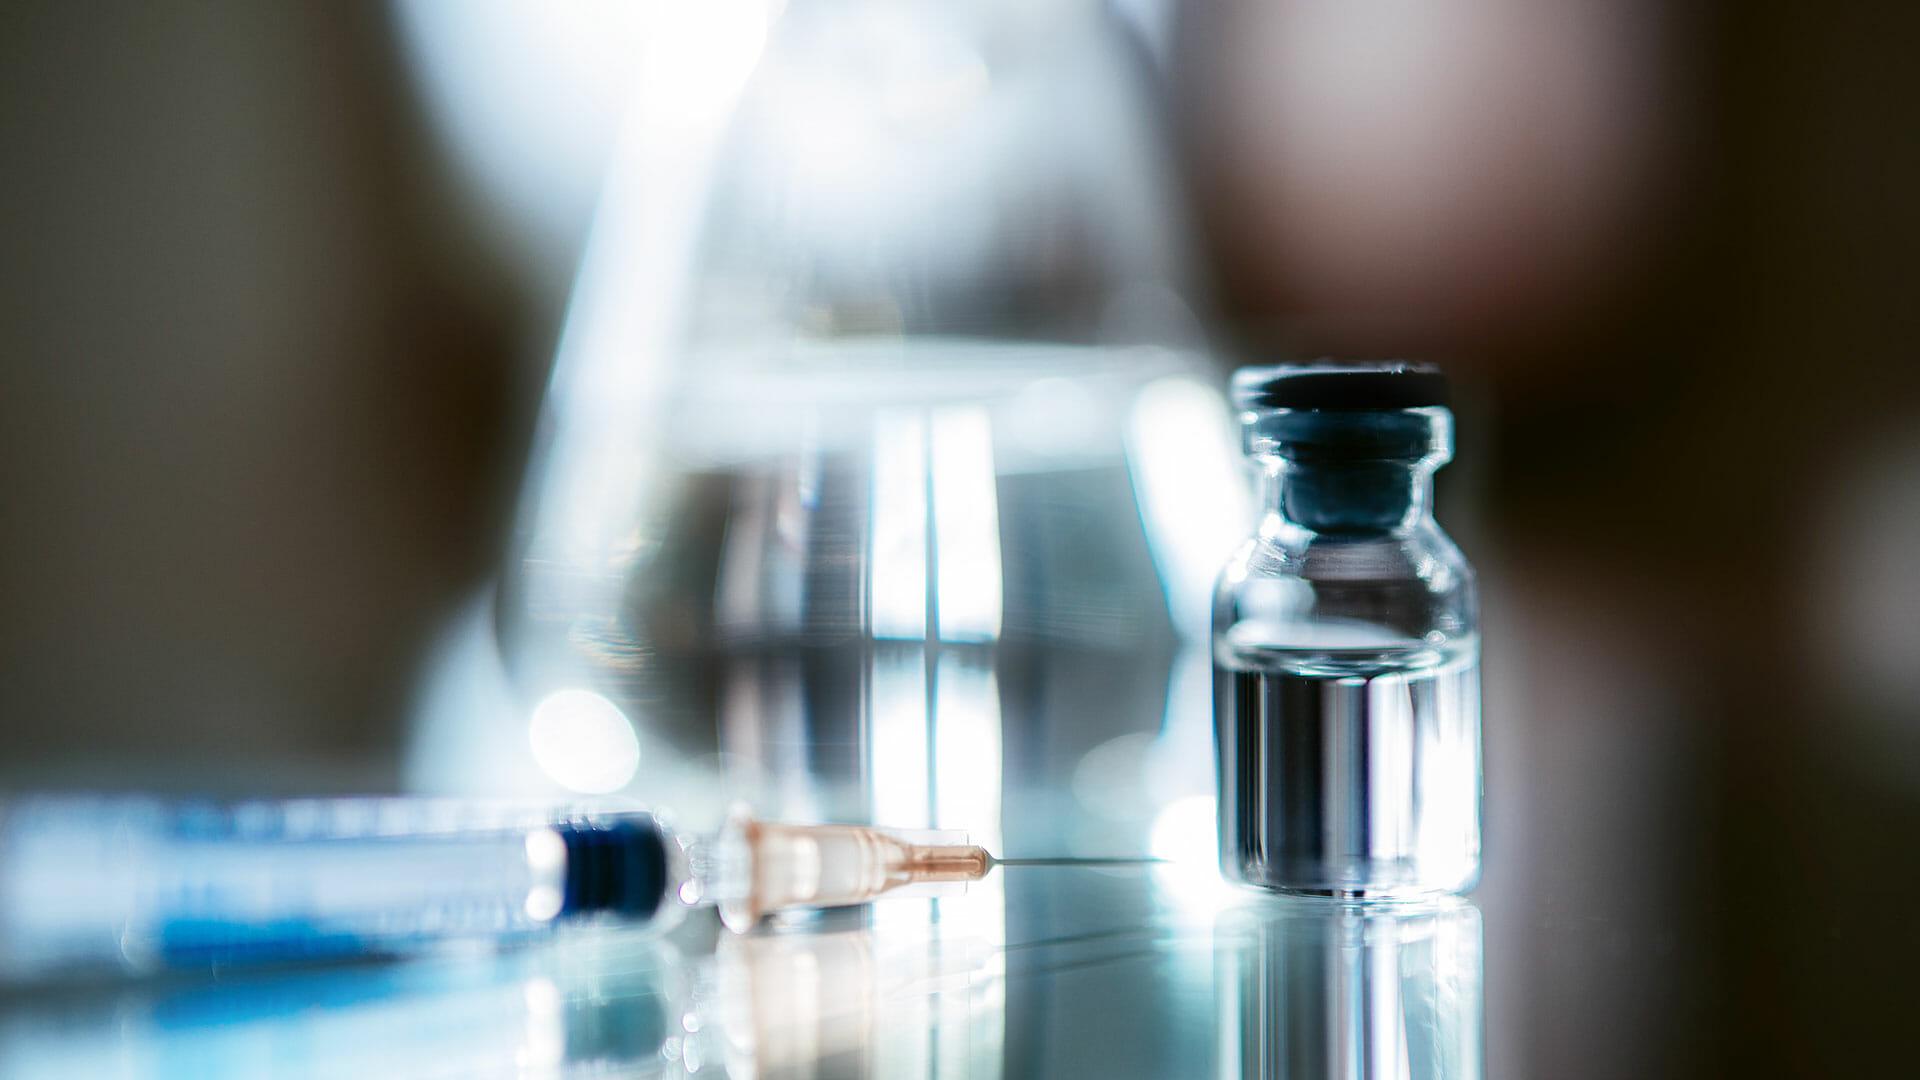 Vaccine Injury Myths Debunked